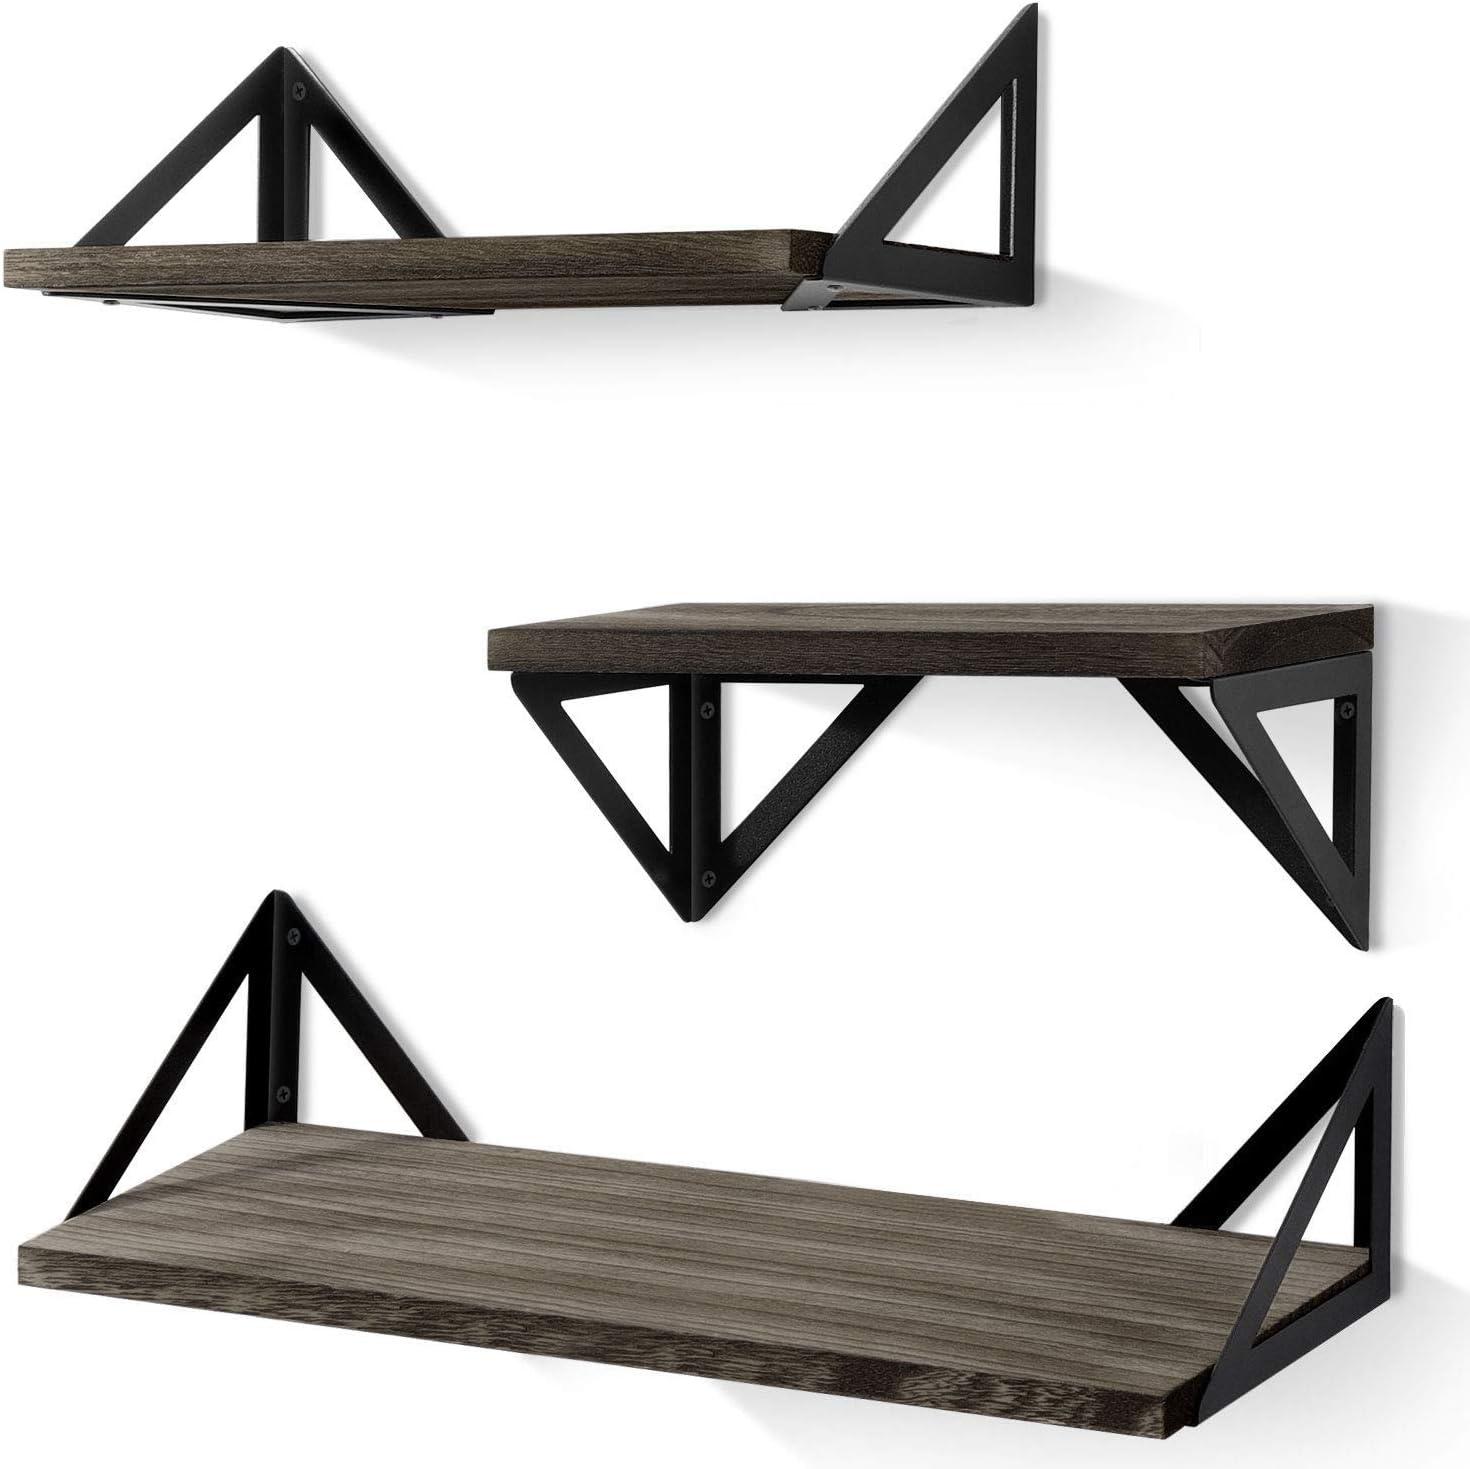 BAYKA Floating Shelves Wall Mounted, Rustic Wood Wall Shelves Set of 3 for Bedroom, Bathroom, Living Room, Kitchen (Grey): Home & Kitchen